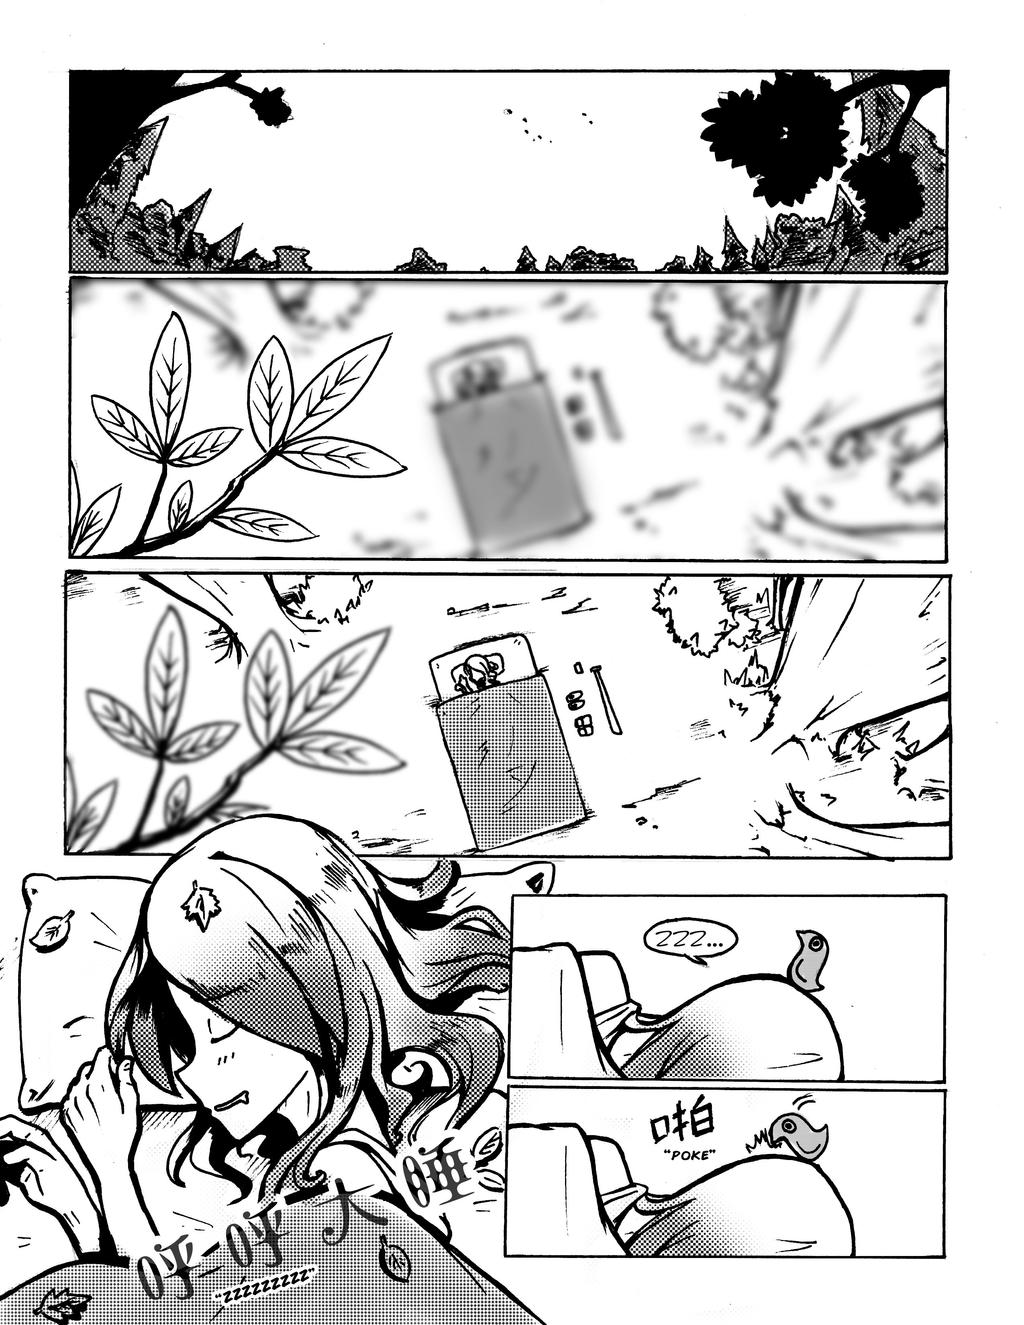 Nin1 page 29 by monkingjonathan